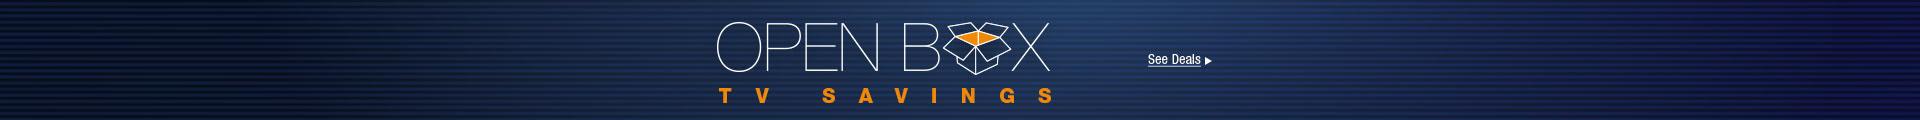 Open Box TV Savings